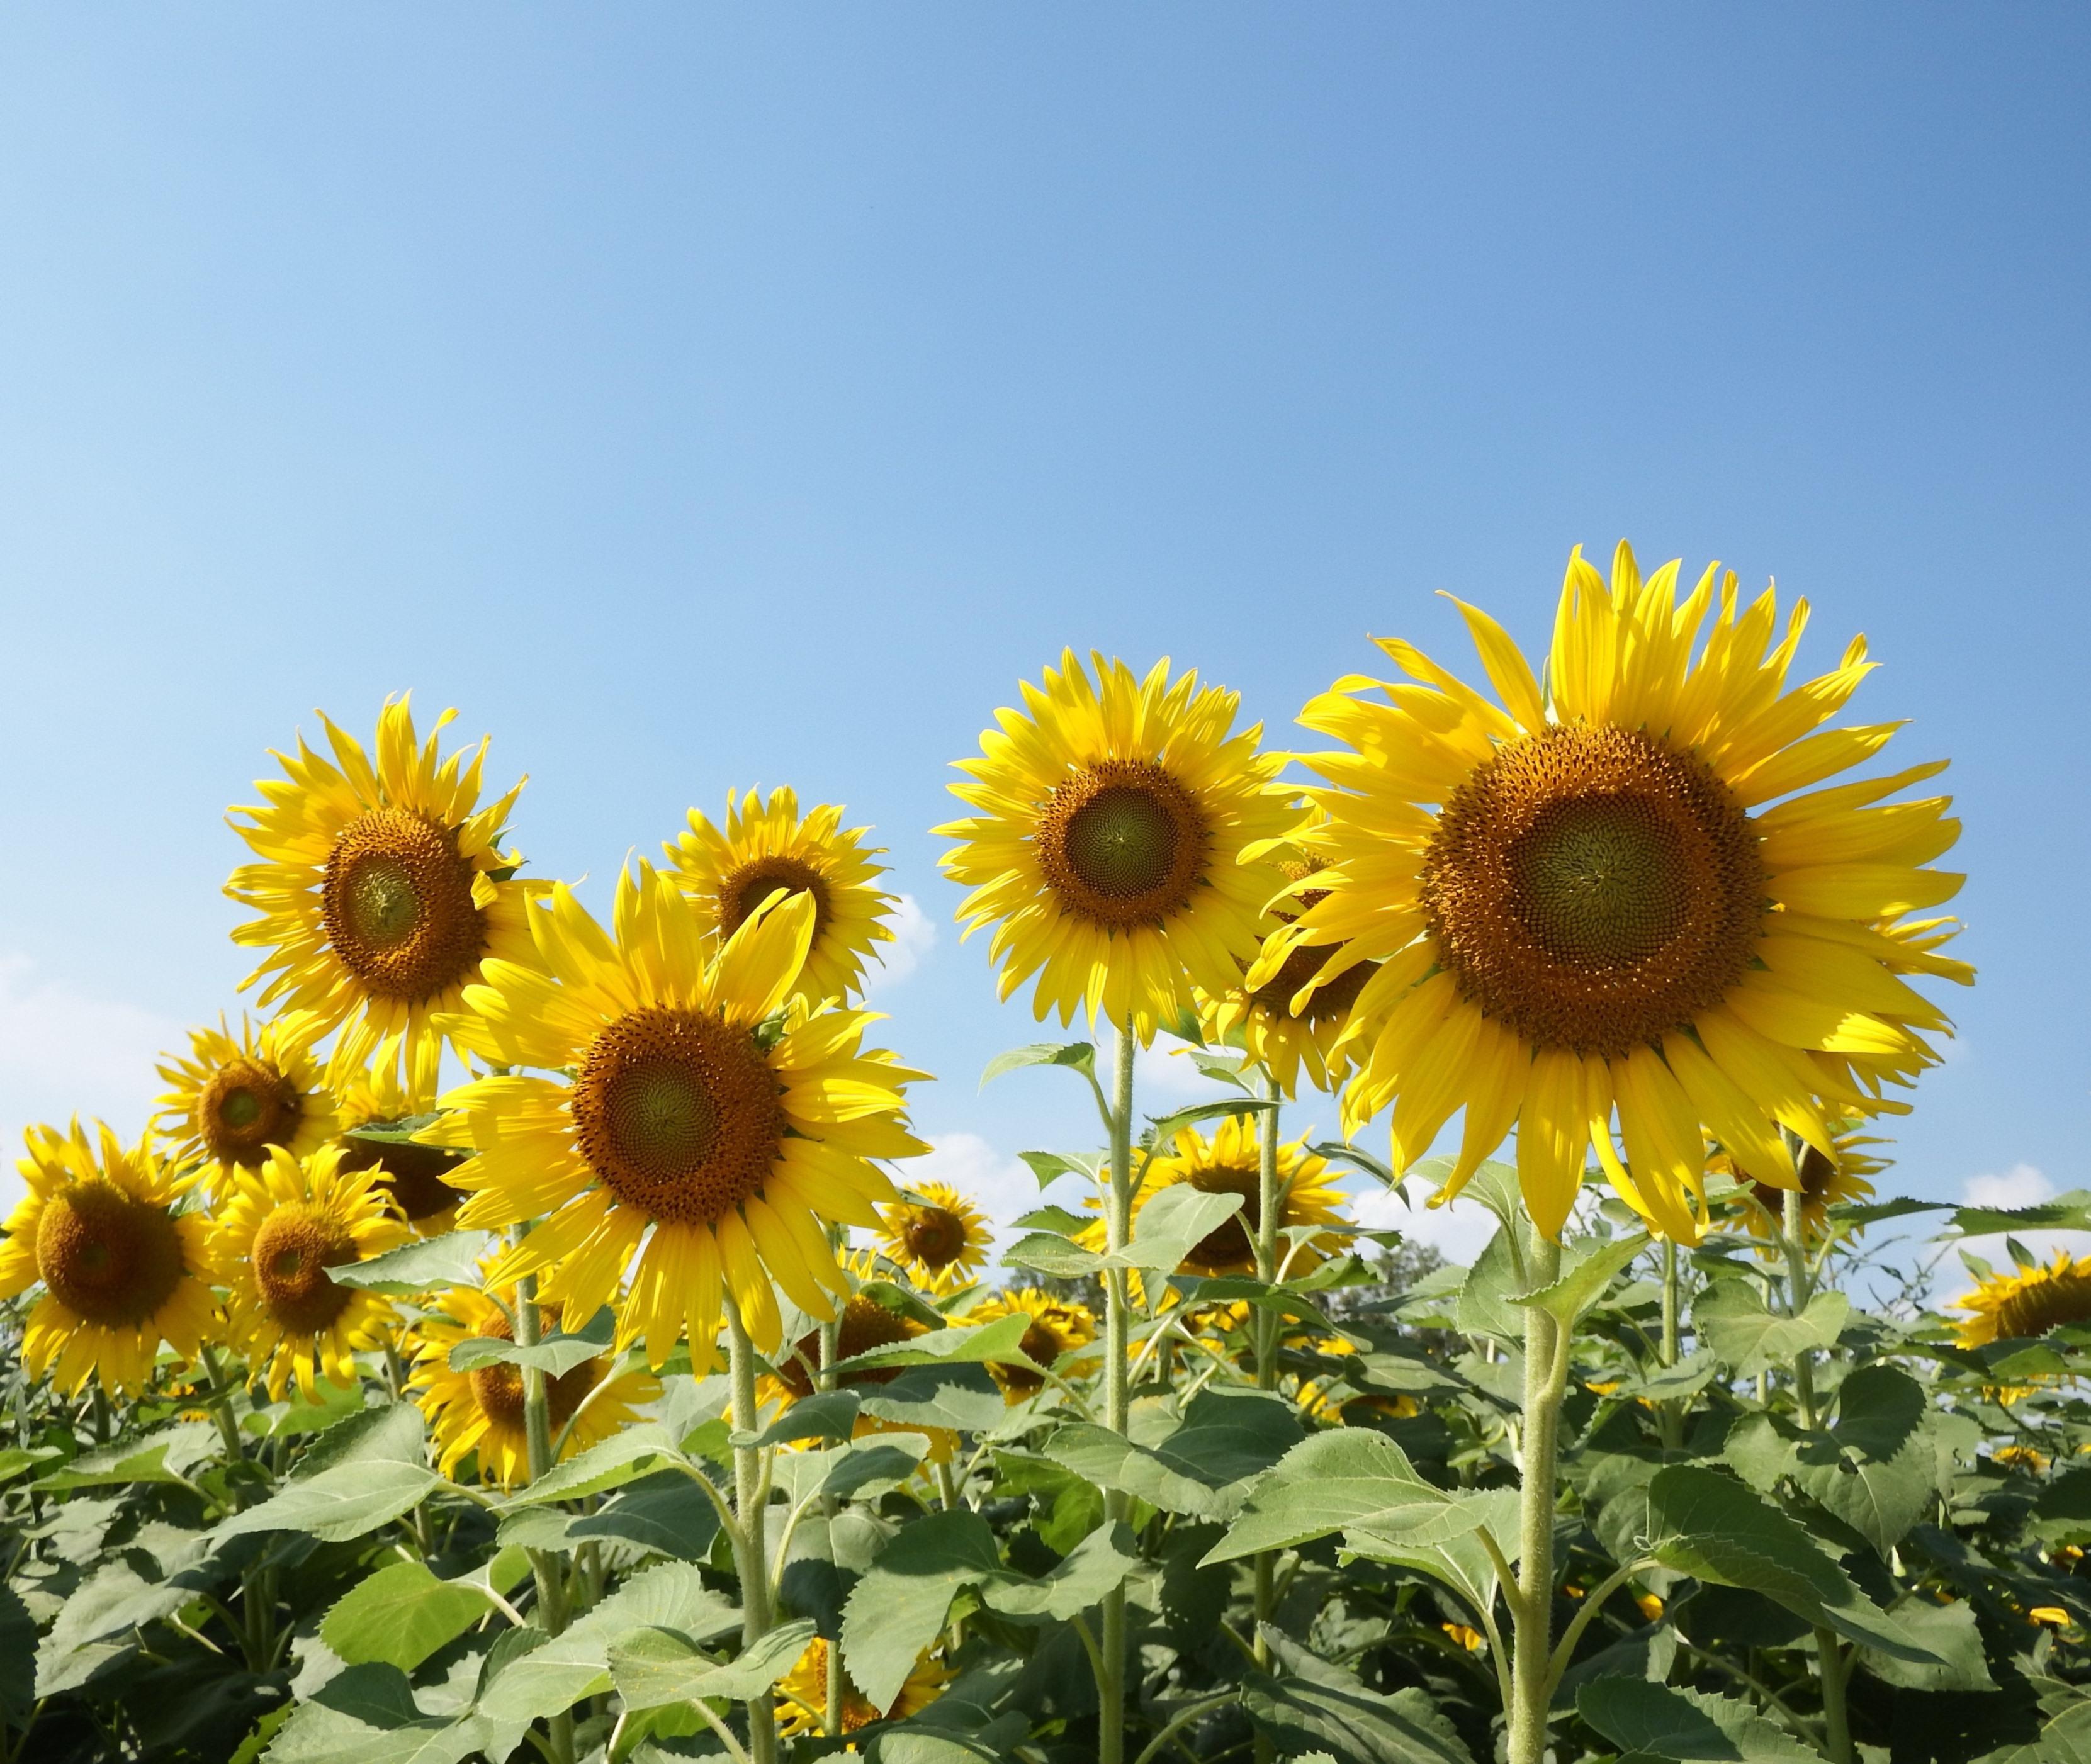 Sunflower Field, Plant, Rural, Photo, Pettles, HQ Photo